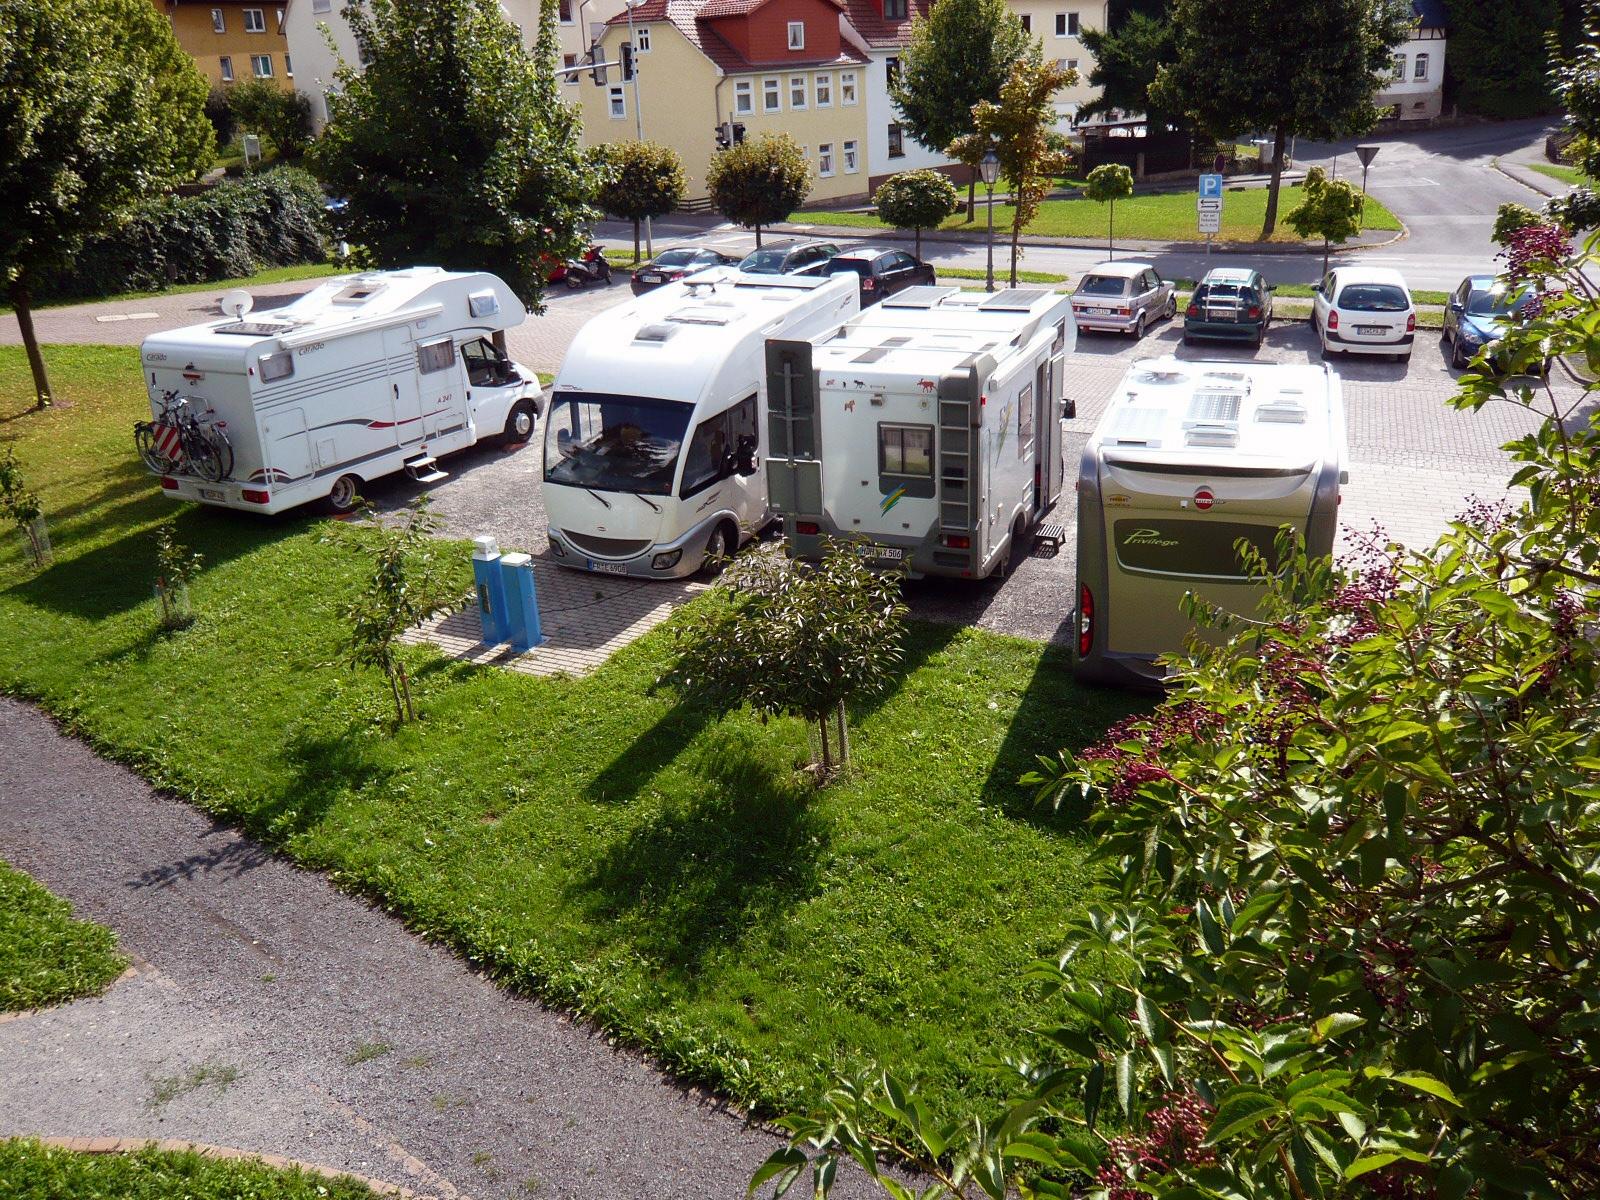 Witzenhausen-Reisemobilstellplatz-Oberburg-2009-1.jpg